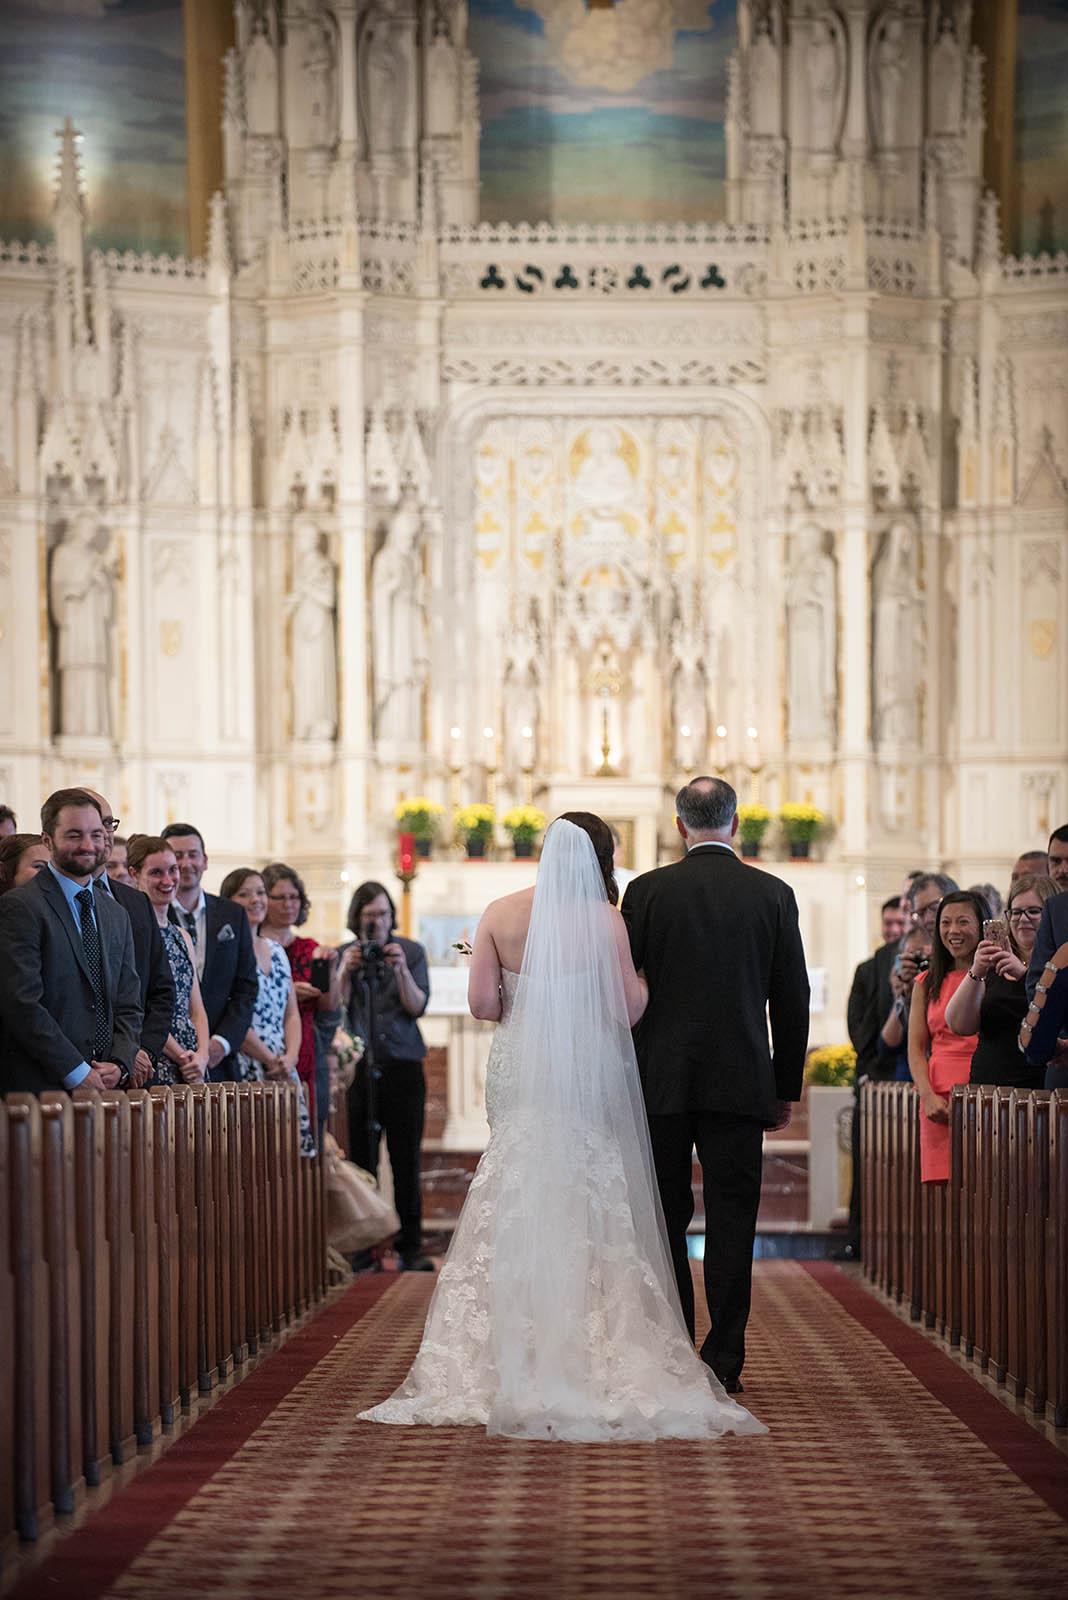 Father Bride Walking Wedding Ceremony